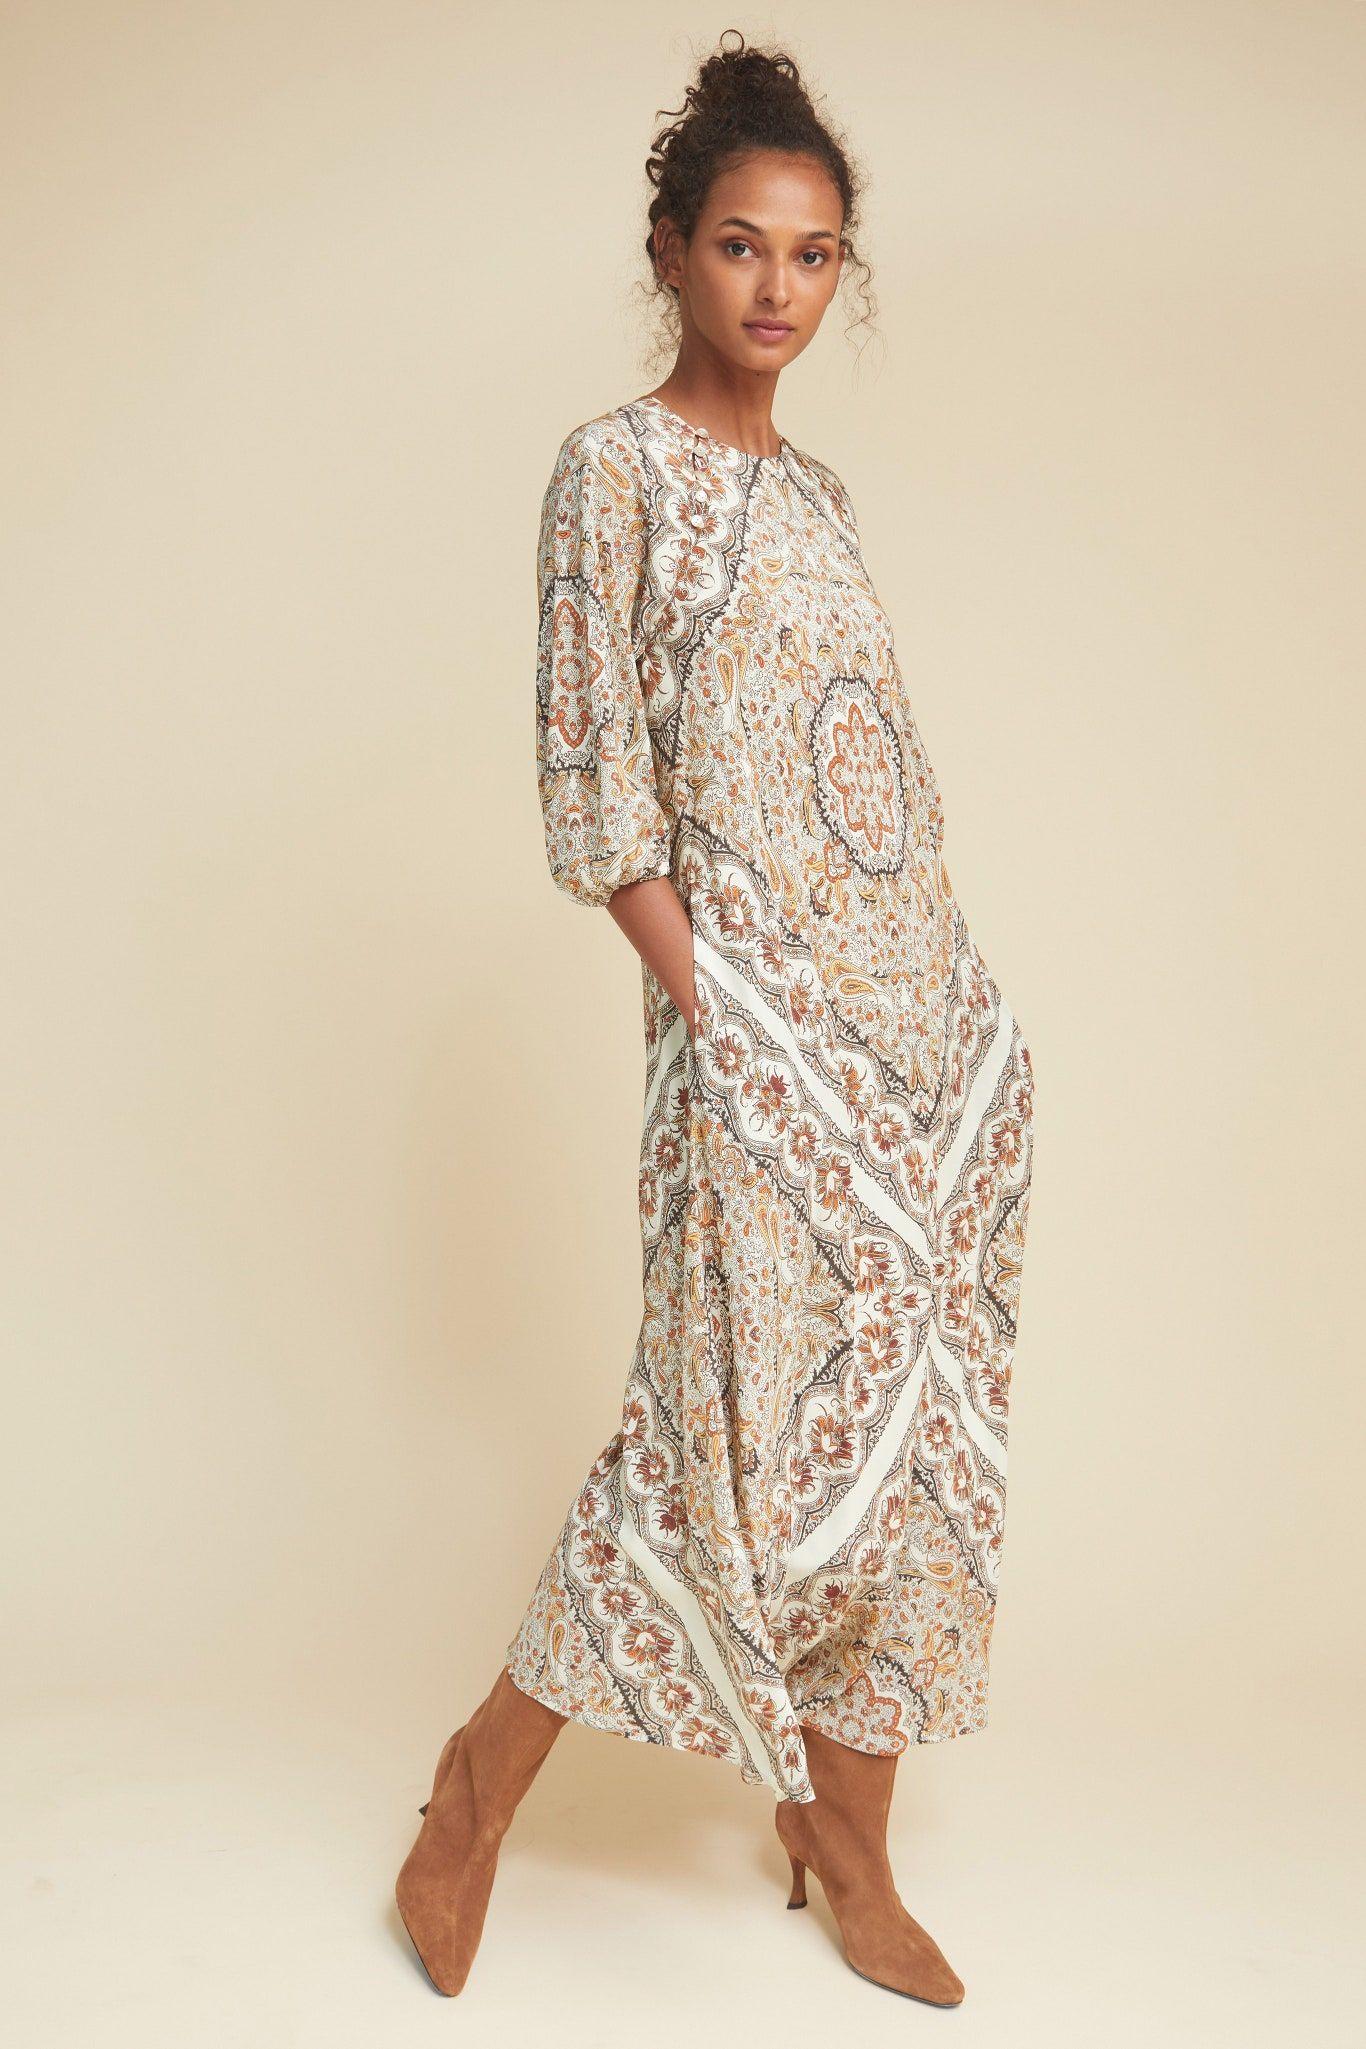 Warm Resort 2021 Fashion Show | Summer fashion dresses ...